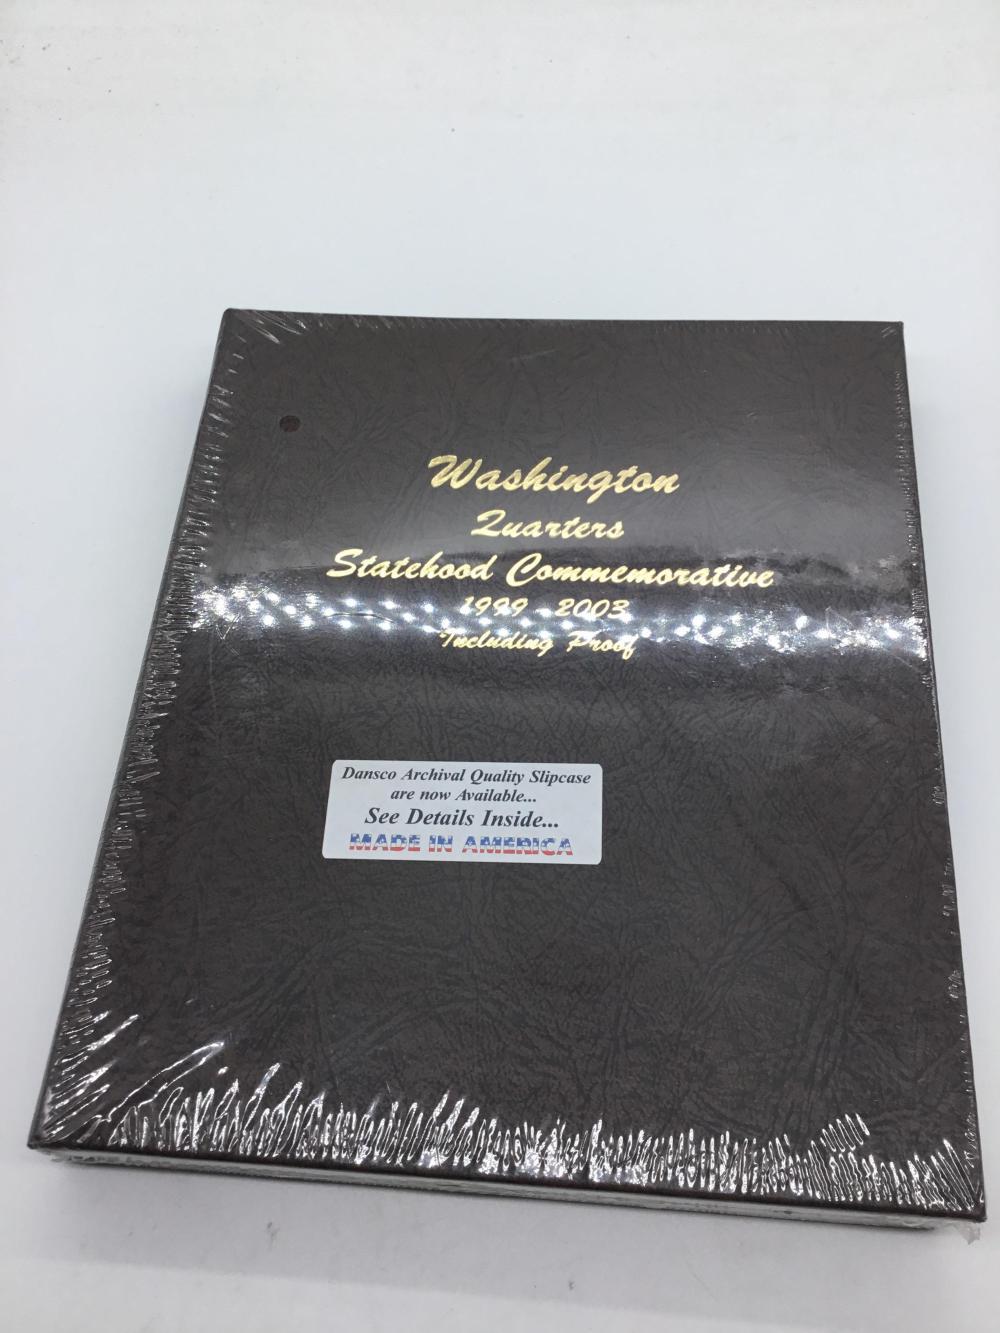 Washington quarter state hood album